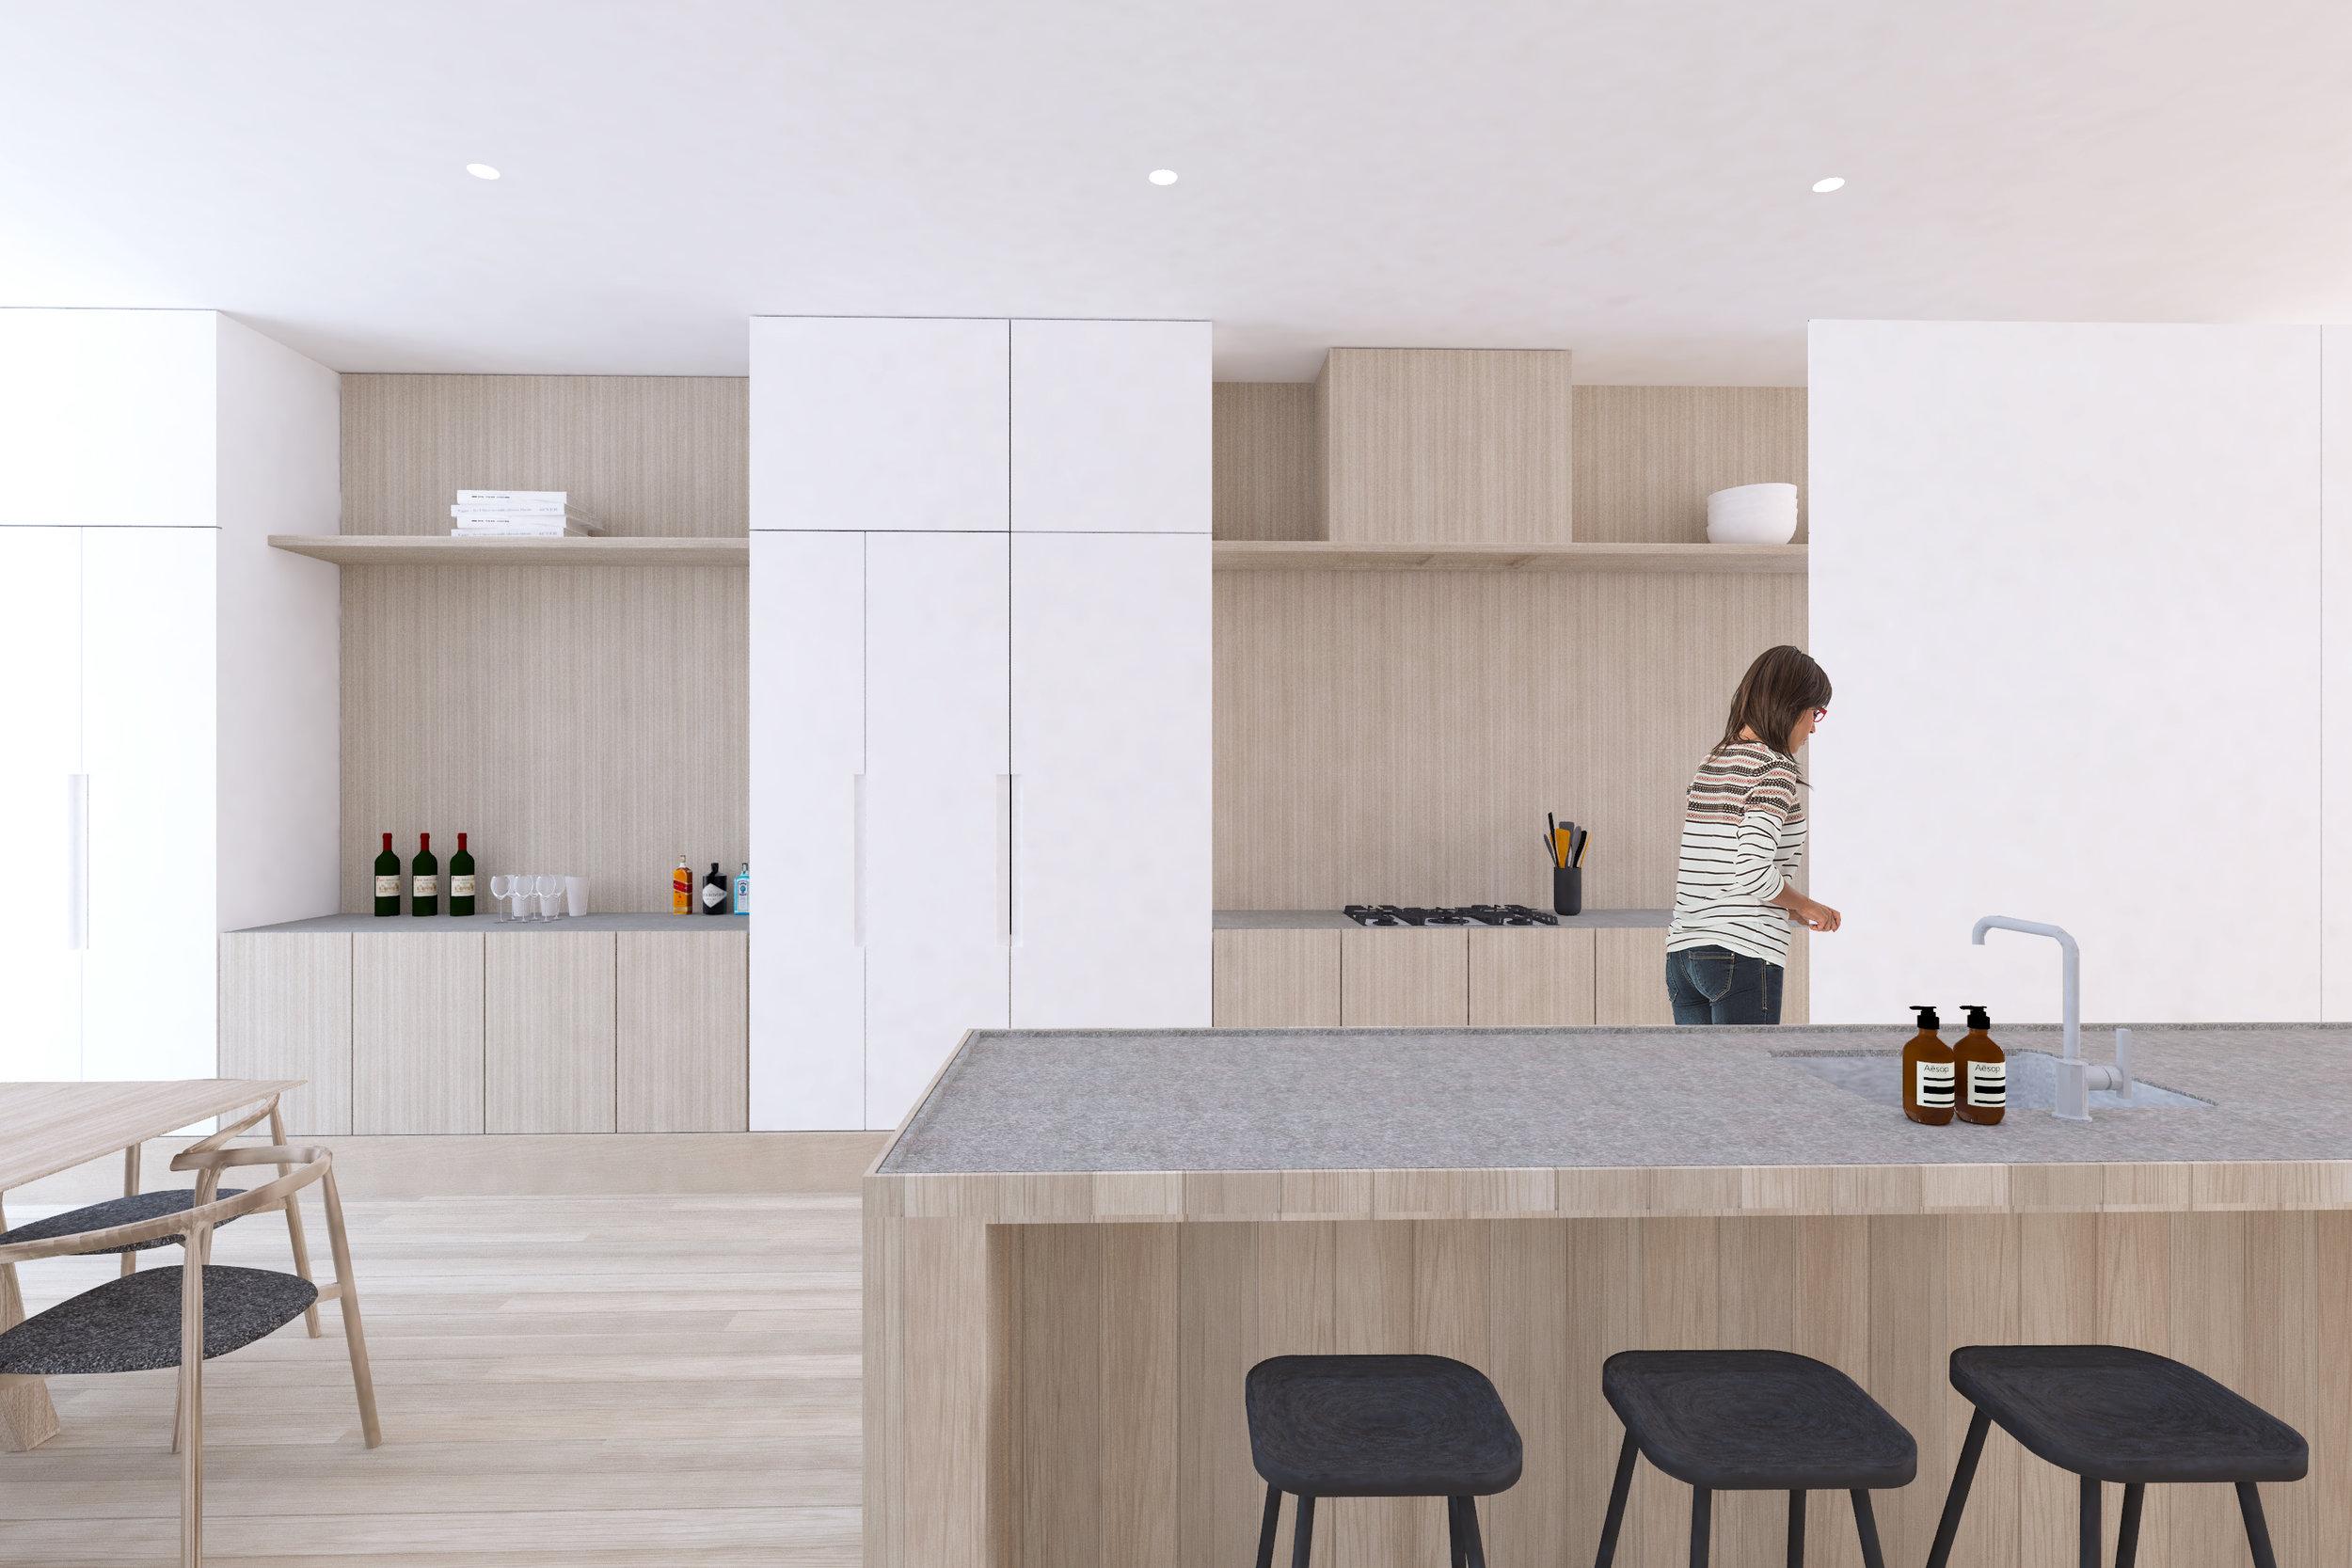 Kitchen Frontal Half Open_Final.jpg